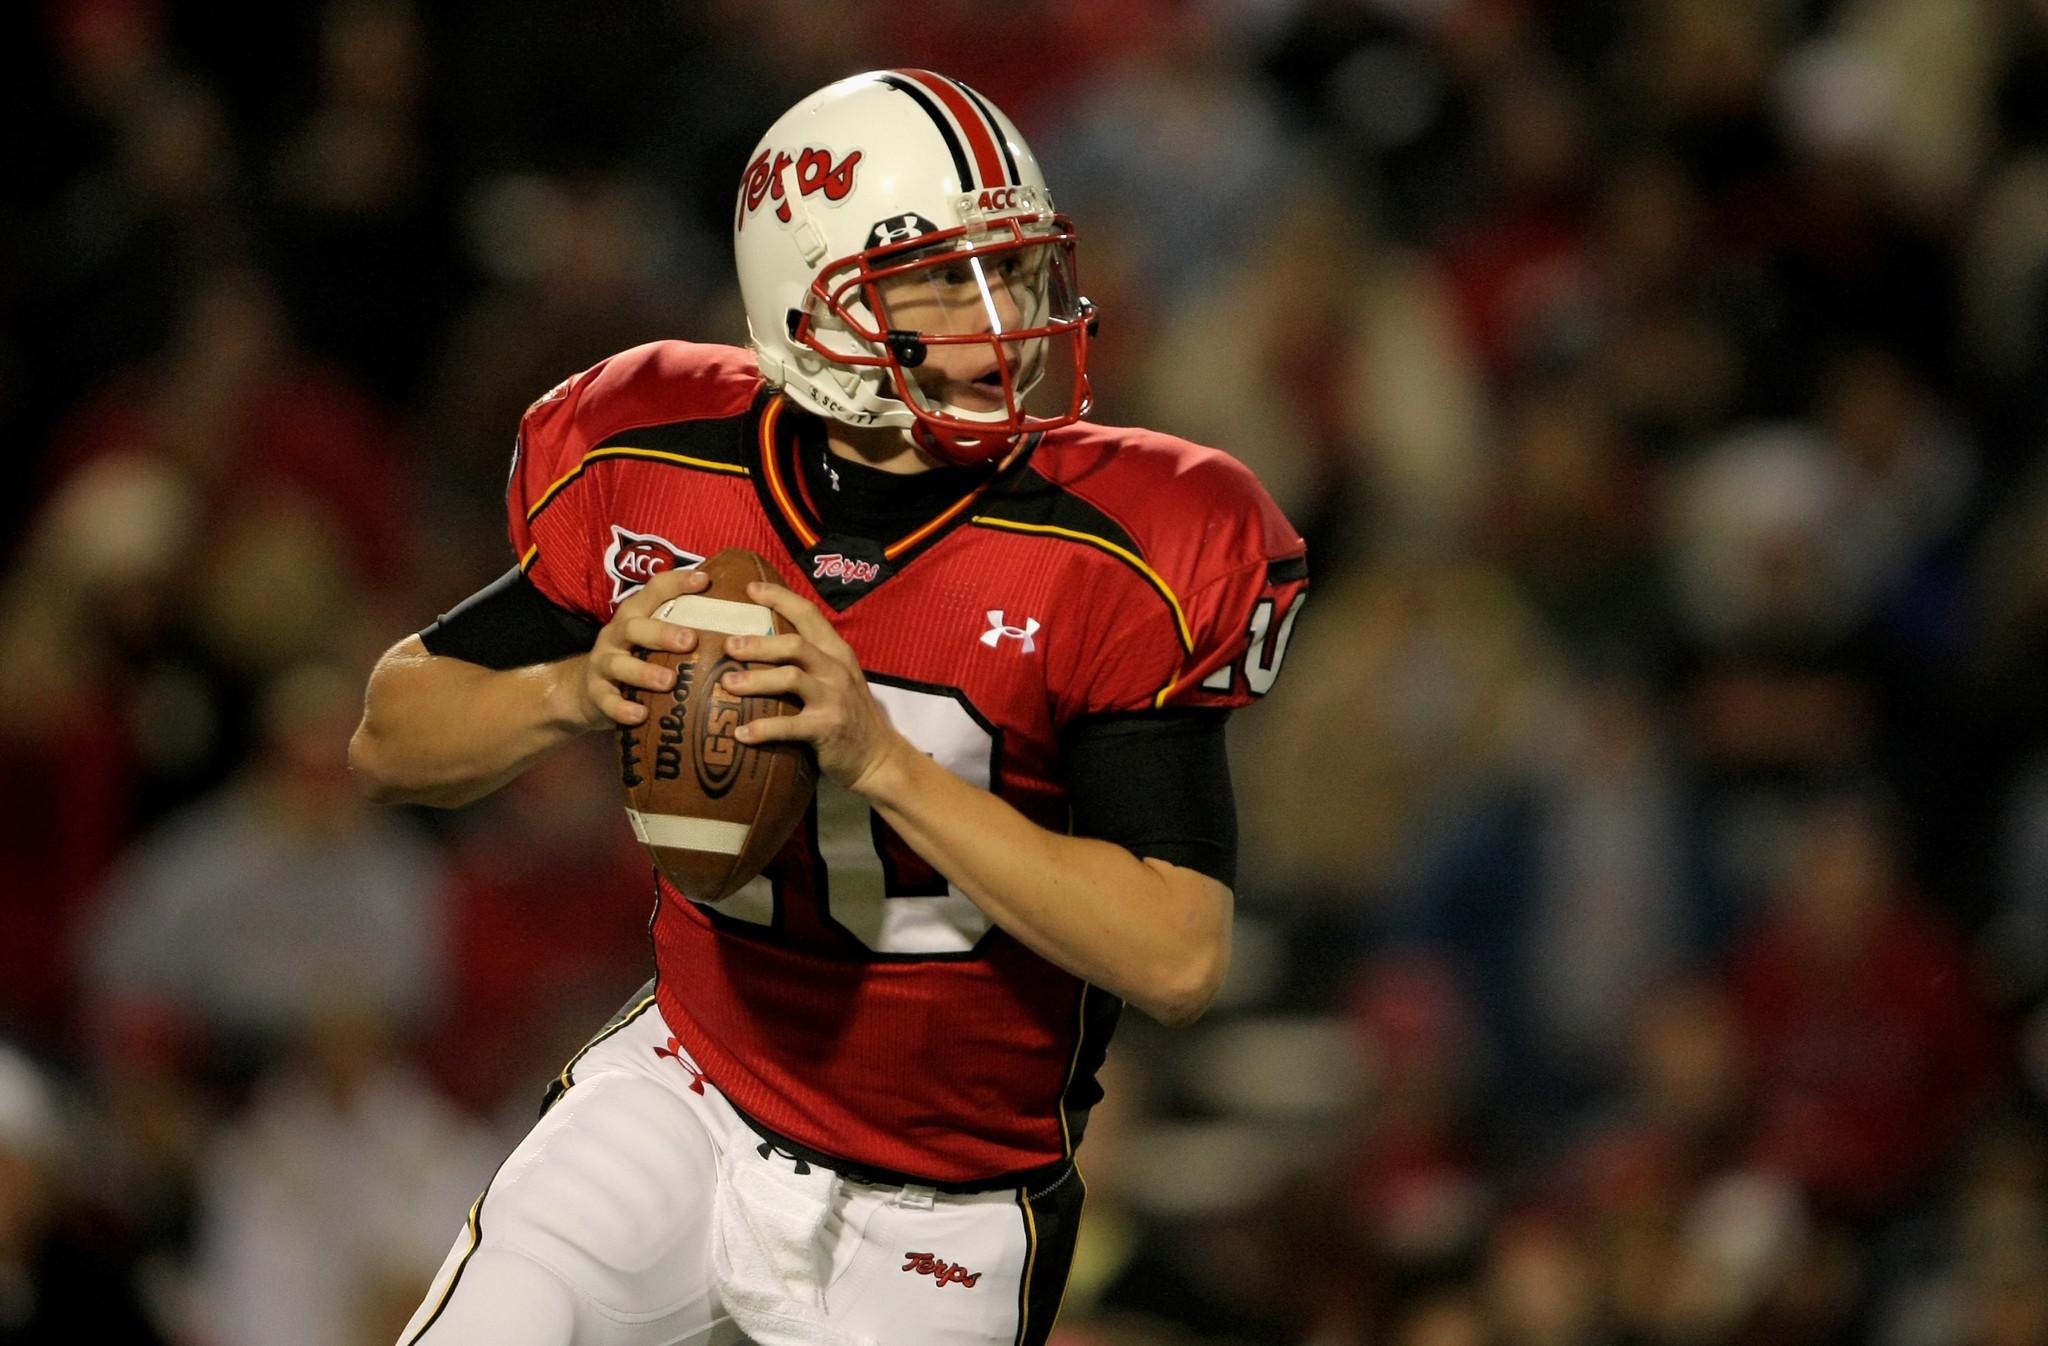 Wallpaper Matt Ryan Matthew Thomas Ryan Quarterback: Catching Up With ... Chris Turner, The Maryland